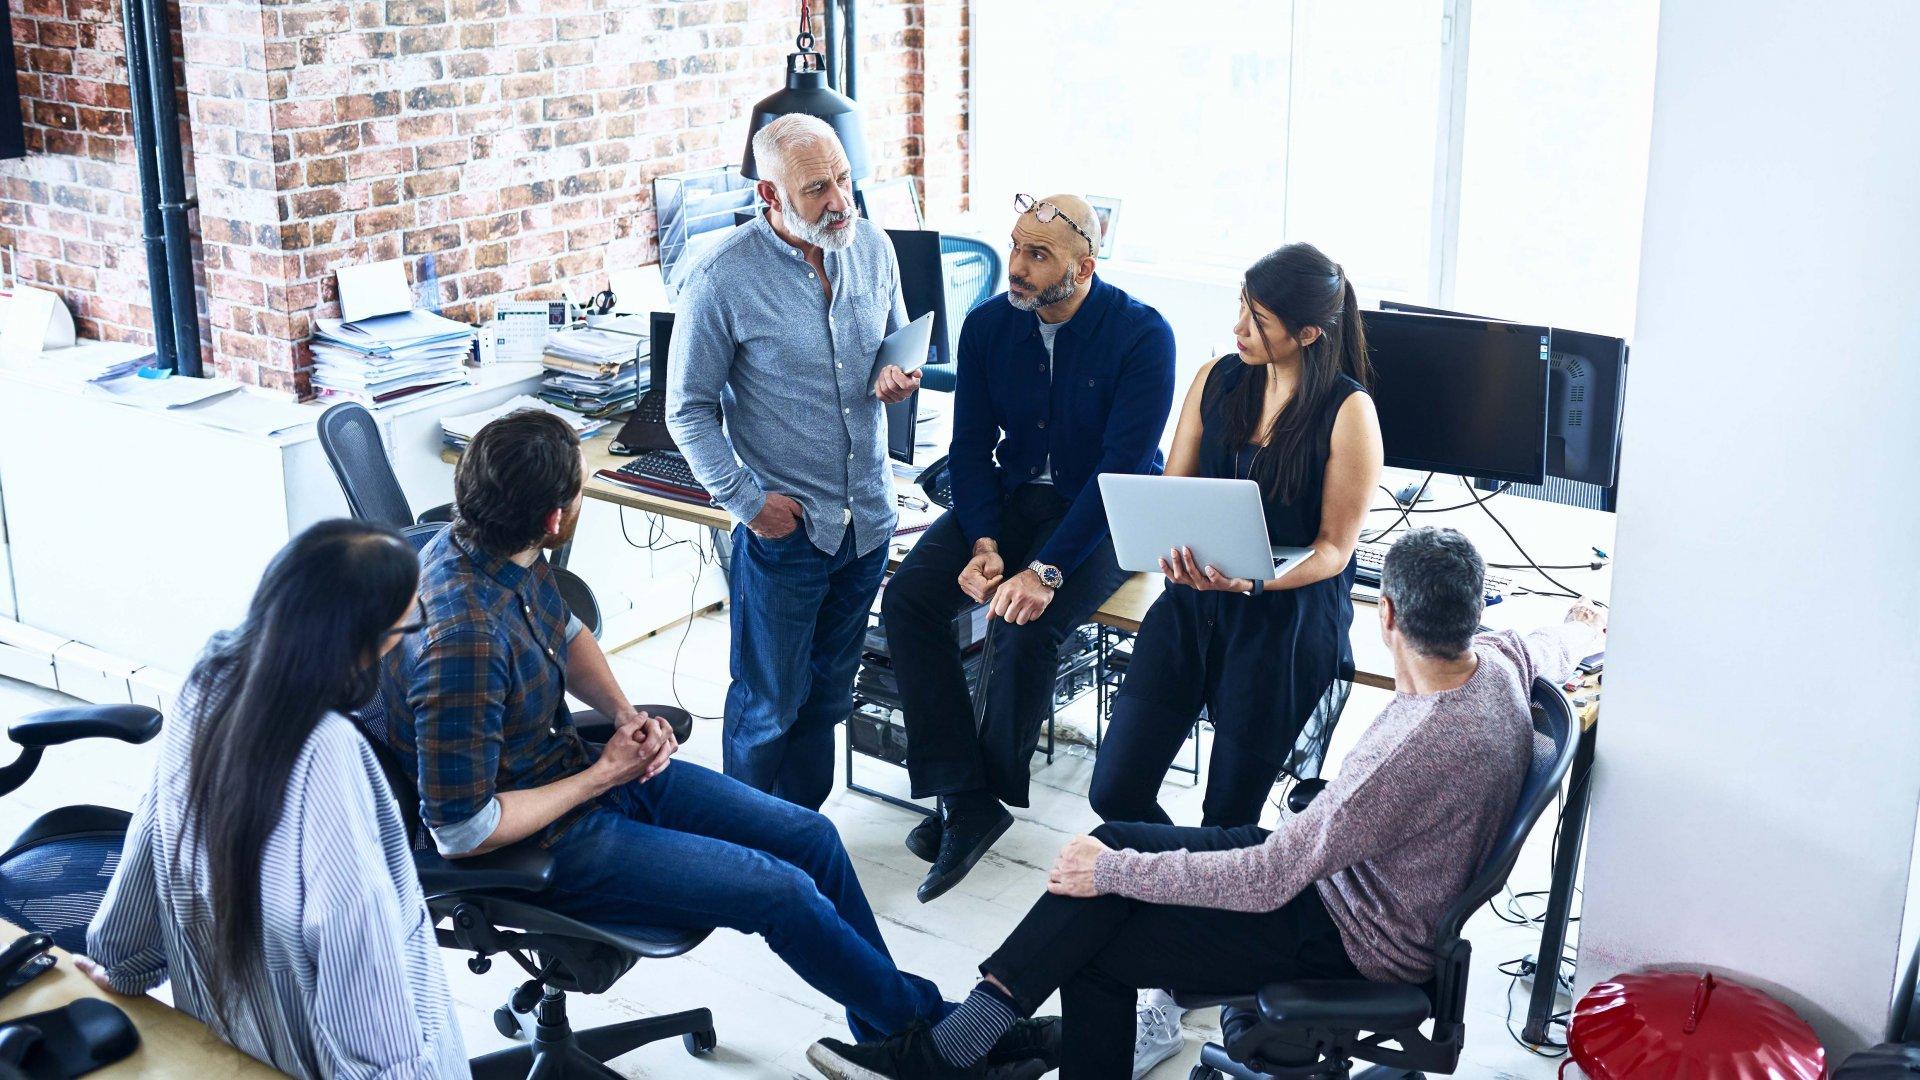 4 Keys to Building a Winner-Take-Most Company